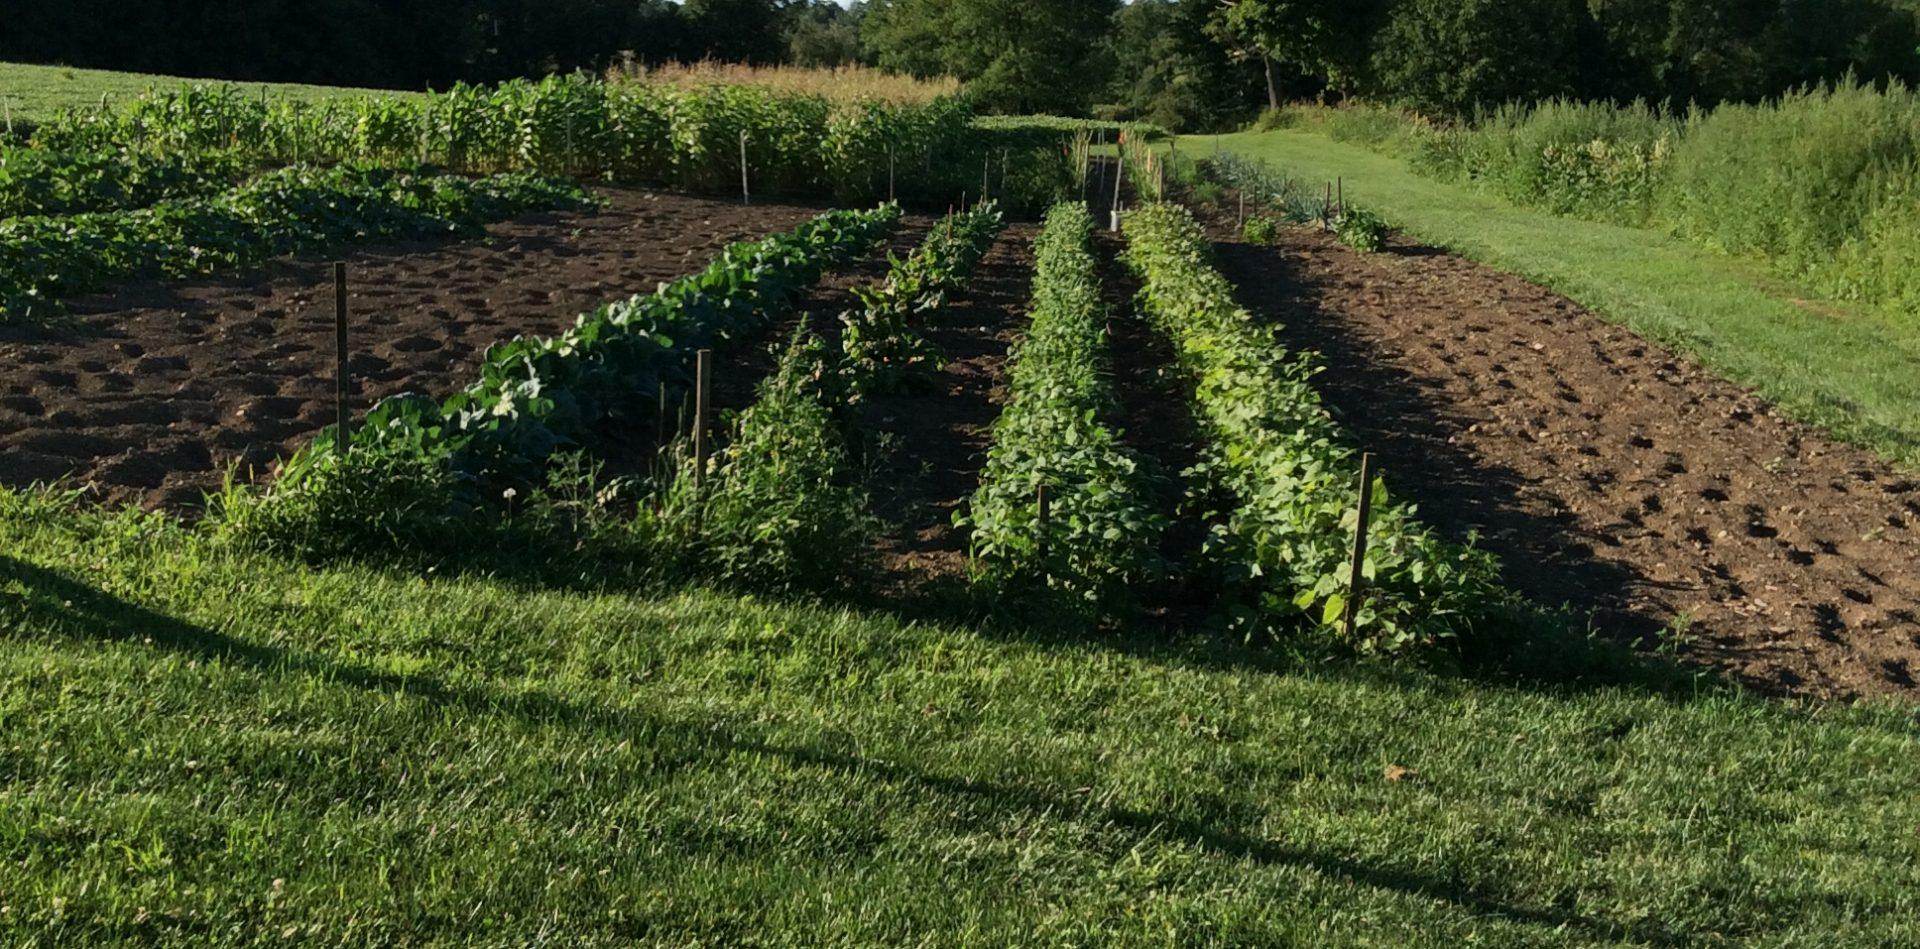 Loiacono Farm LLC